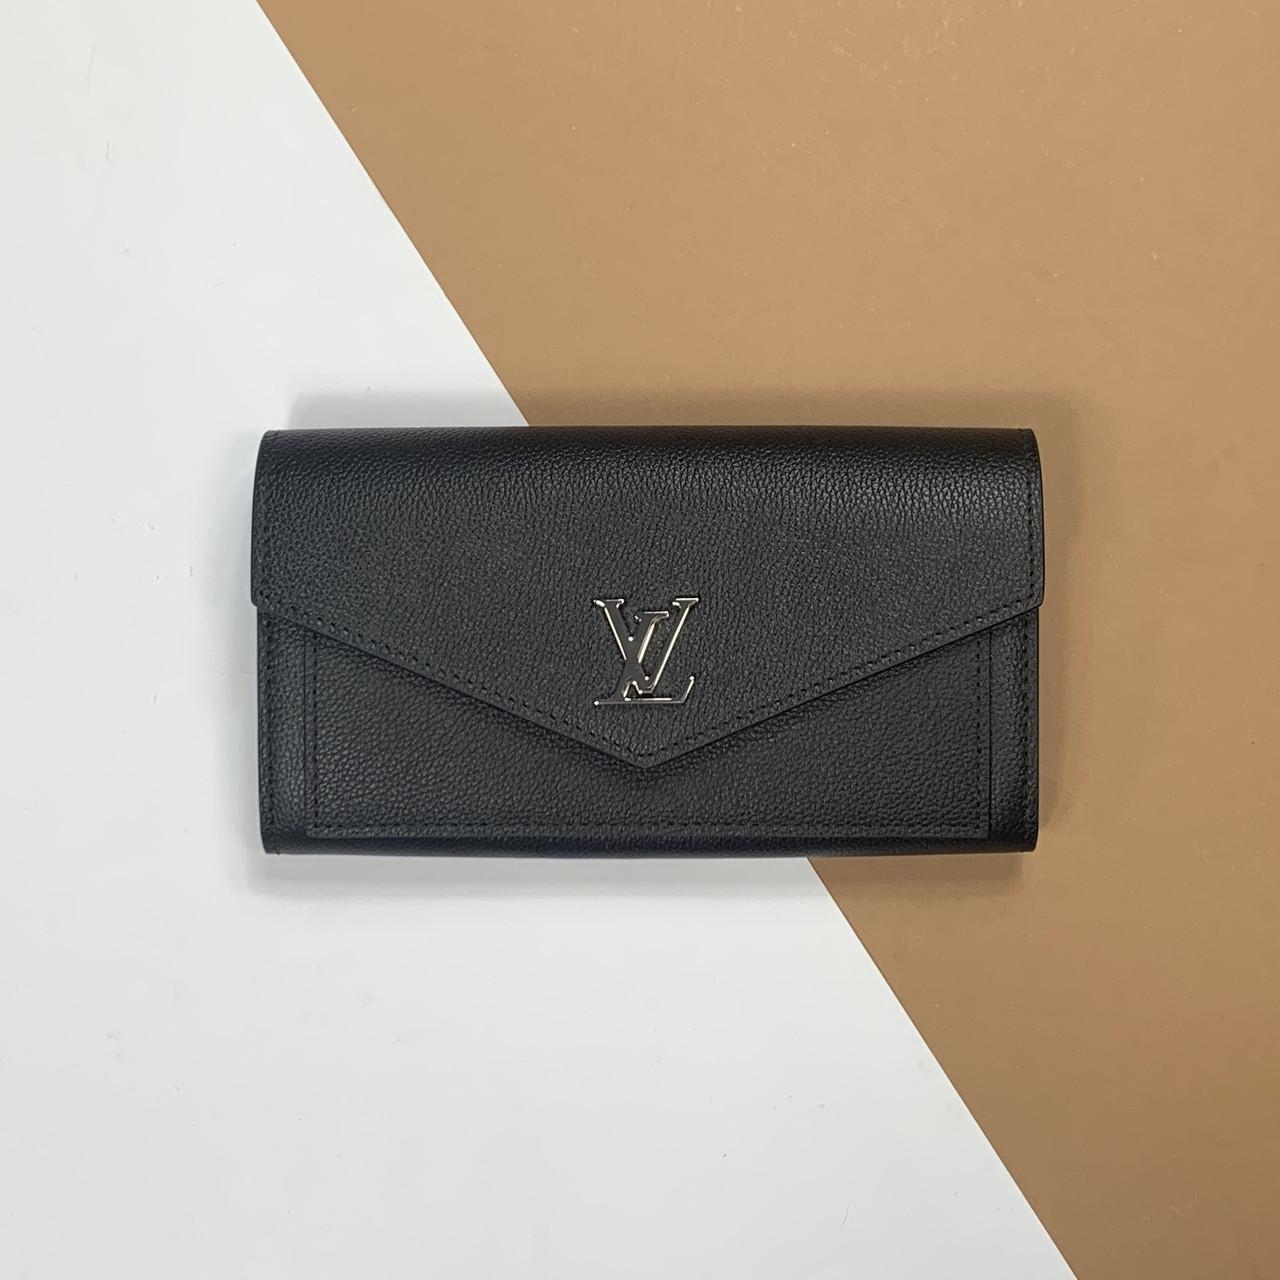 Кошелек Louis Vuitton Mylockme (Луи Виттон) арт. 22-12